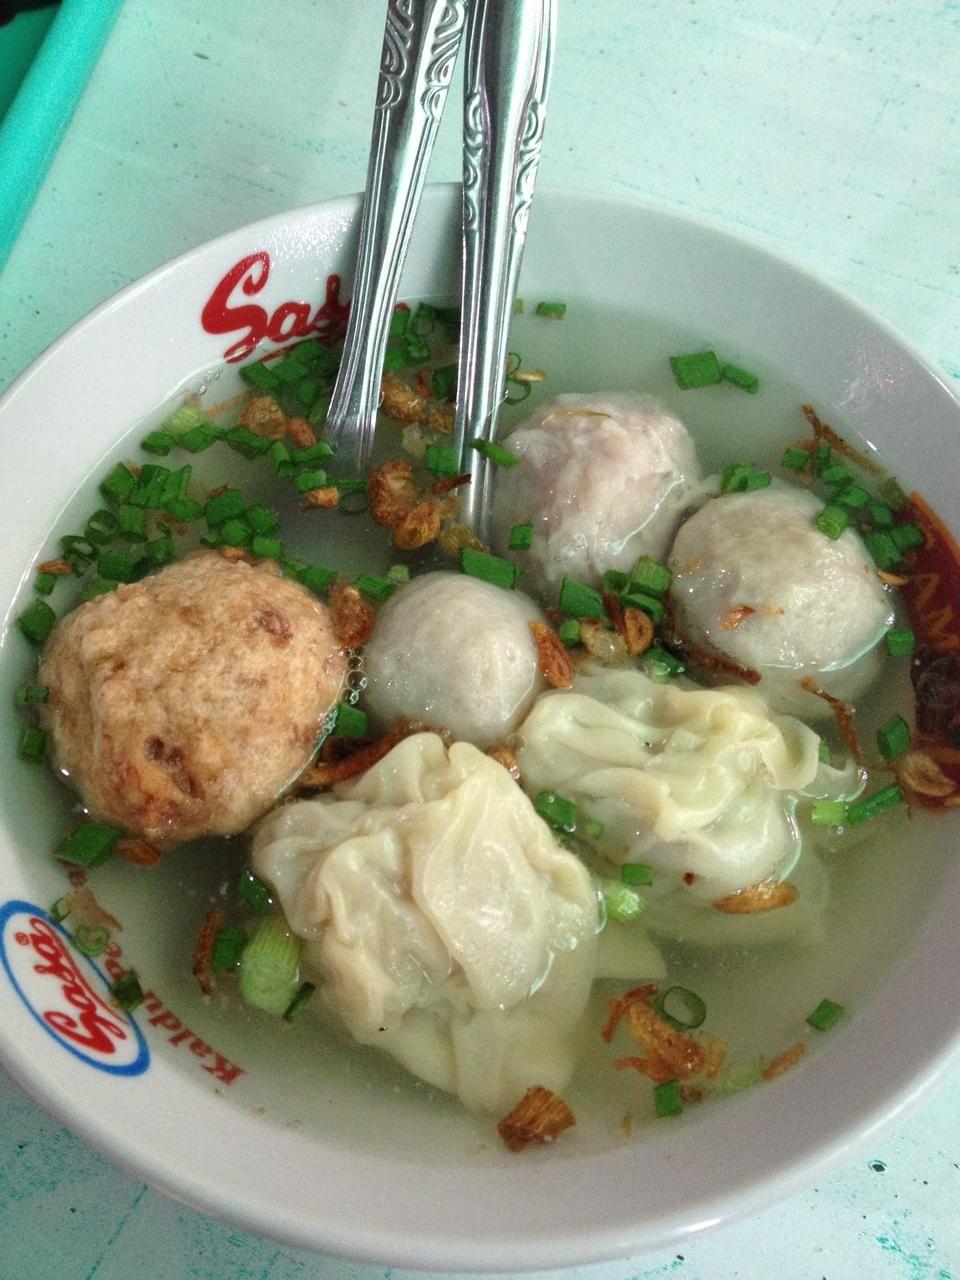 Bakso Subur Malang Jawa Timur Full Meal Recipes Indonesian Food Food Goals